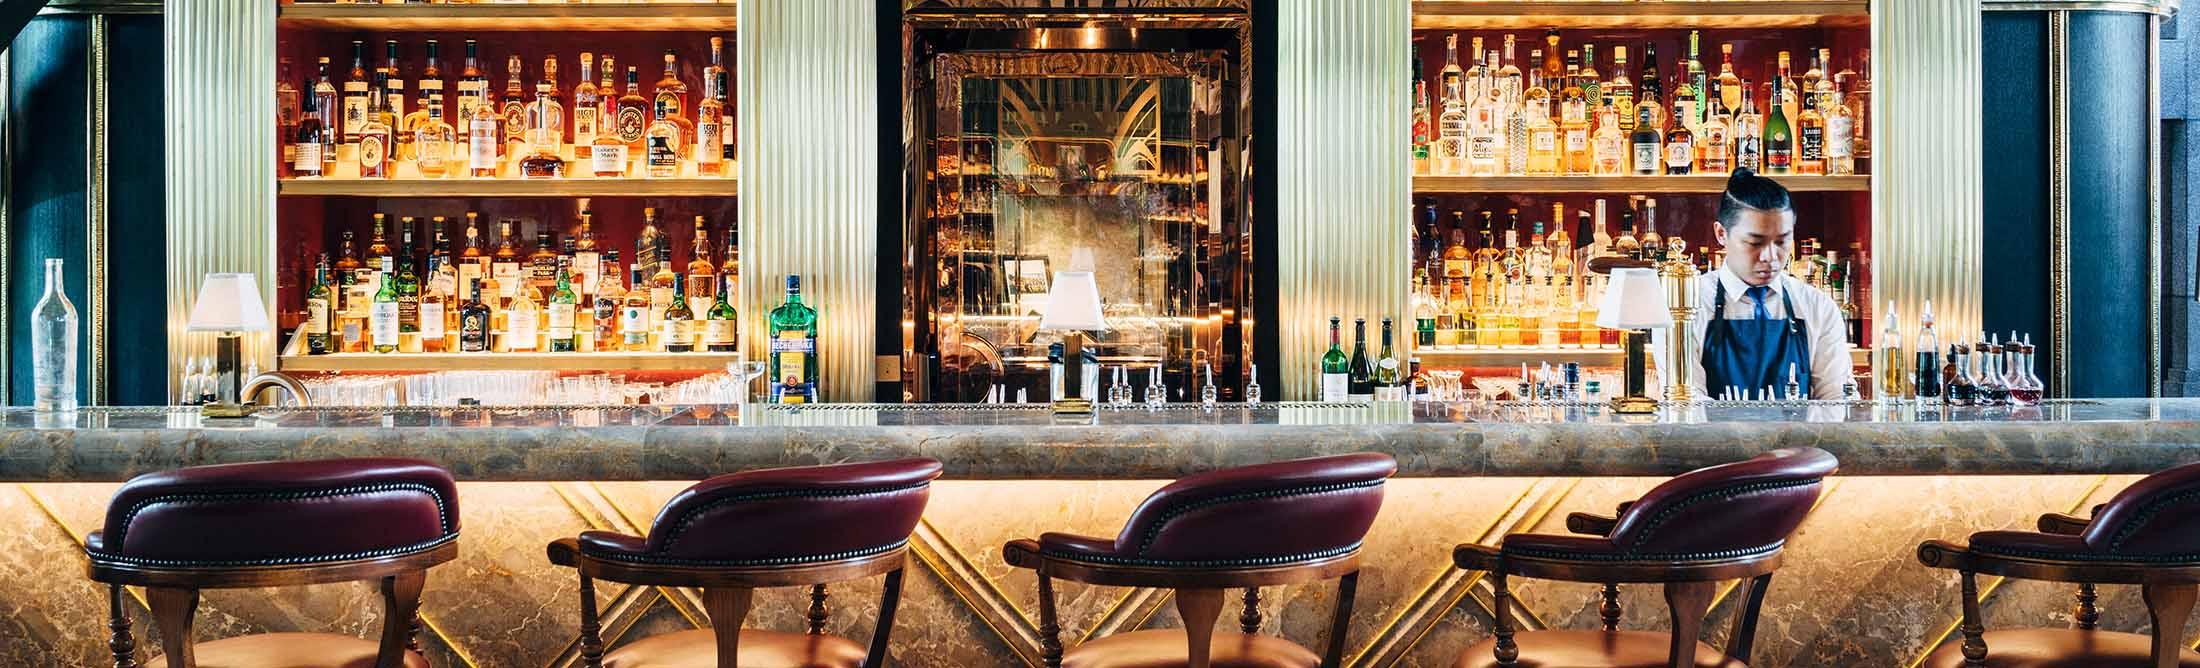 Atlas Bar: el mejor bar de Singapur